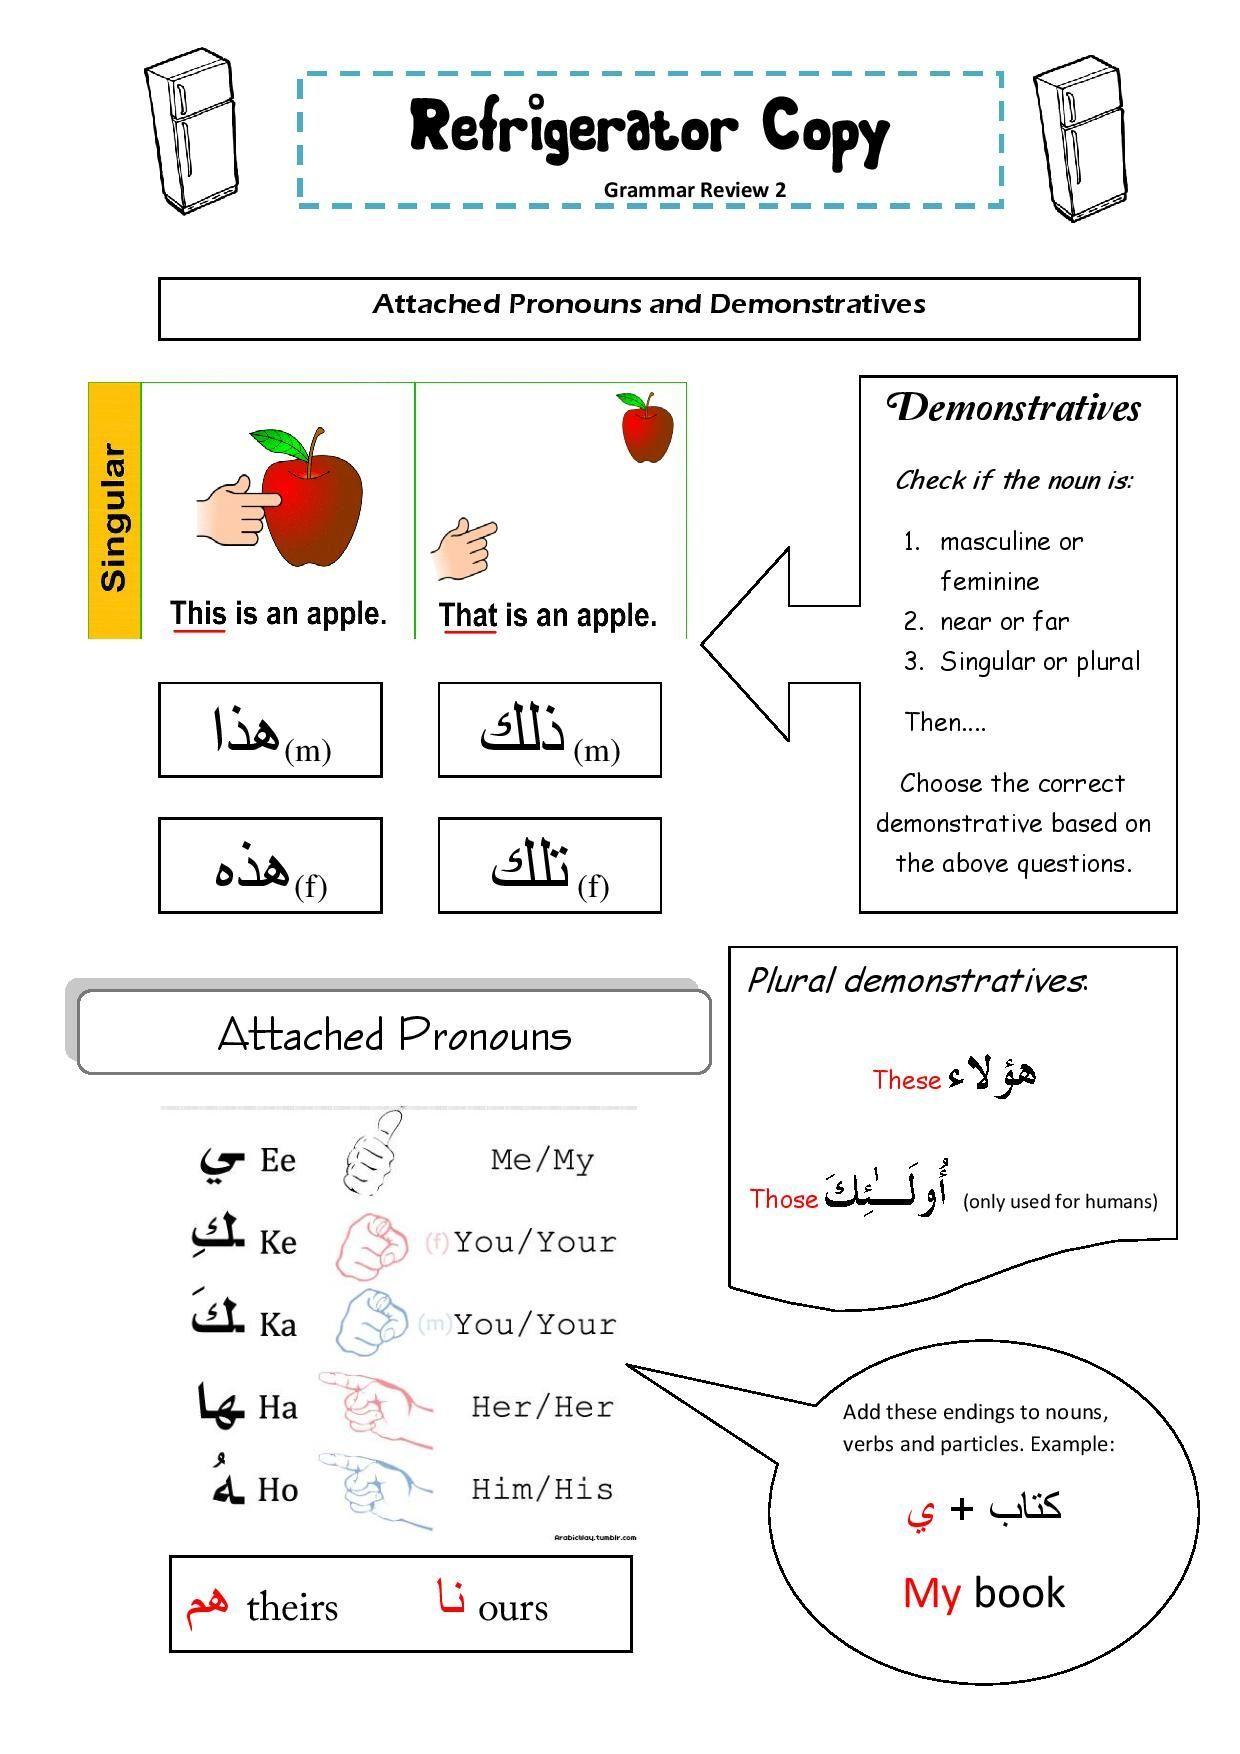 Fridge Copy Grammar Review Sheet Arabic Attached Pronouns